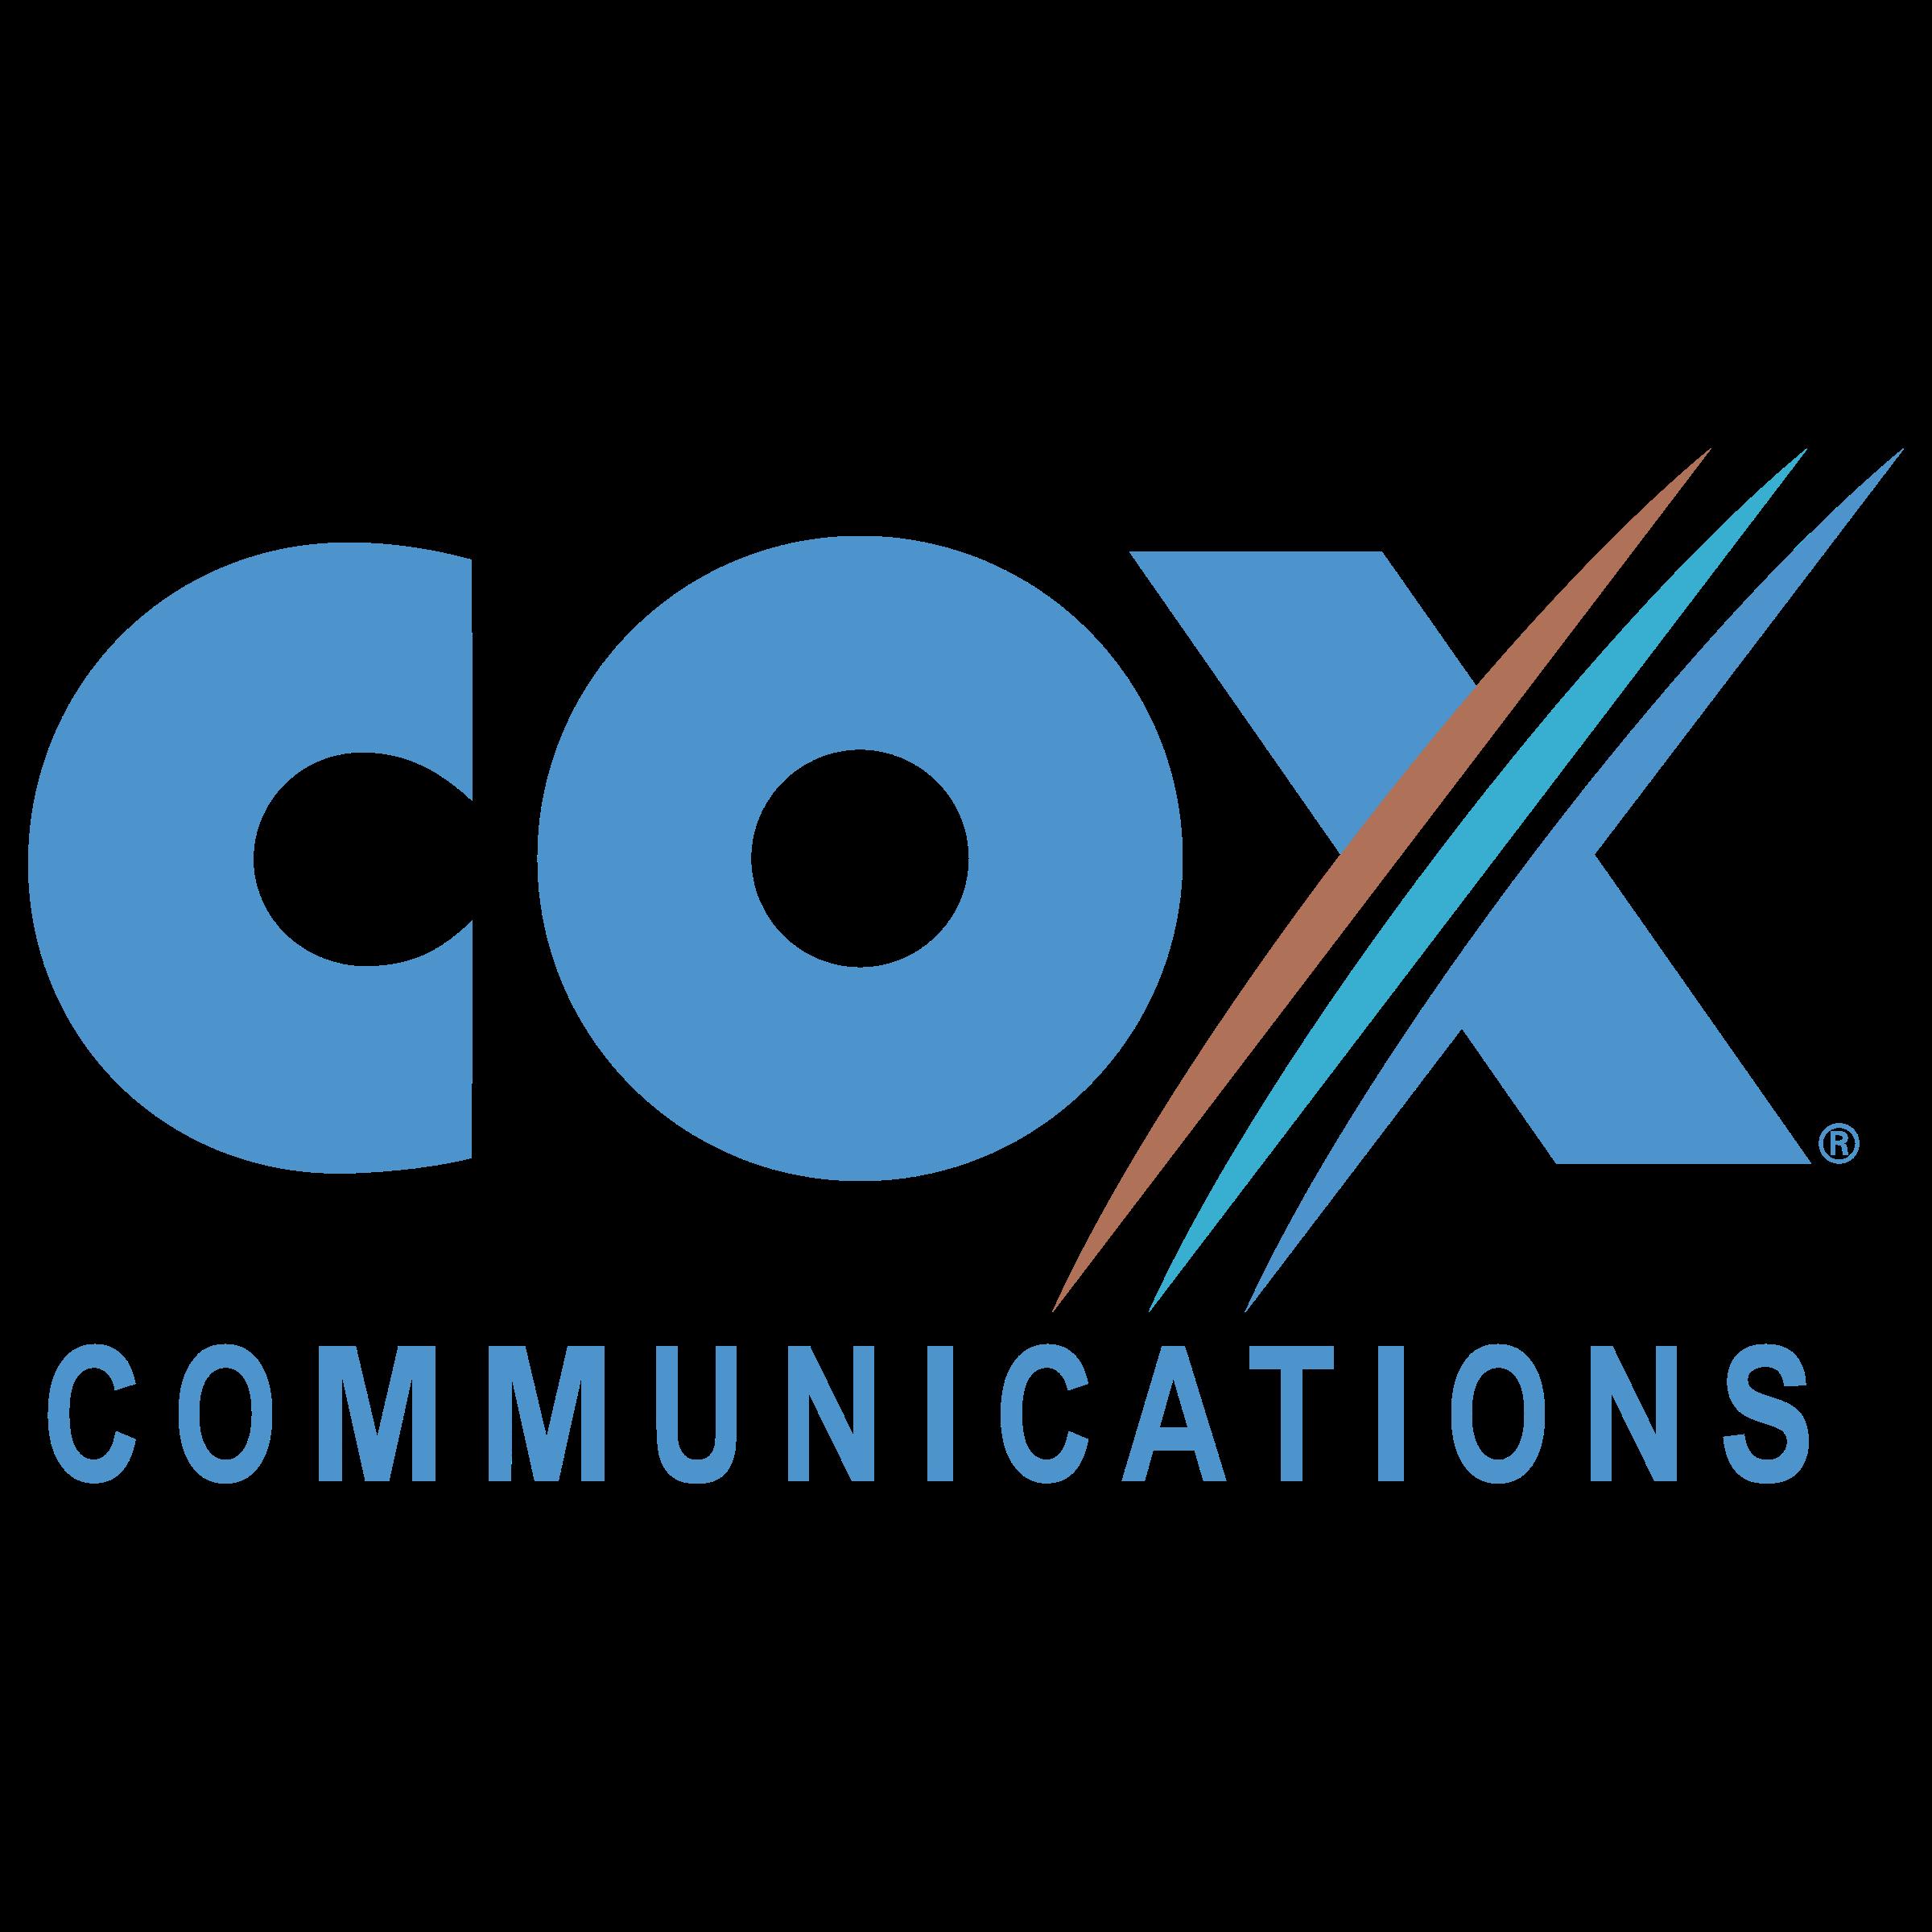 2400x2400 19 Transparent Communications Vector Huge Freebie! Download For